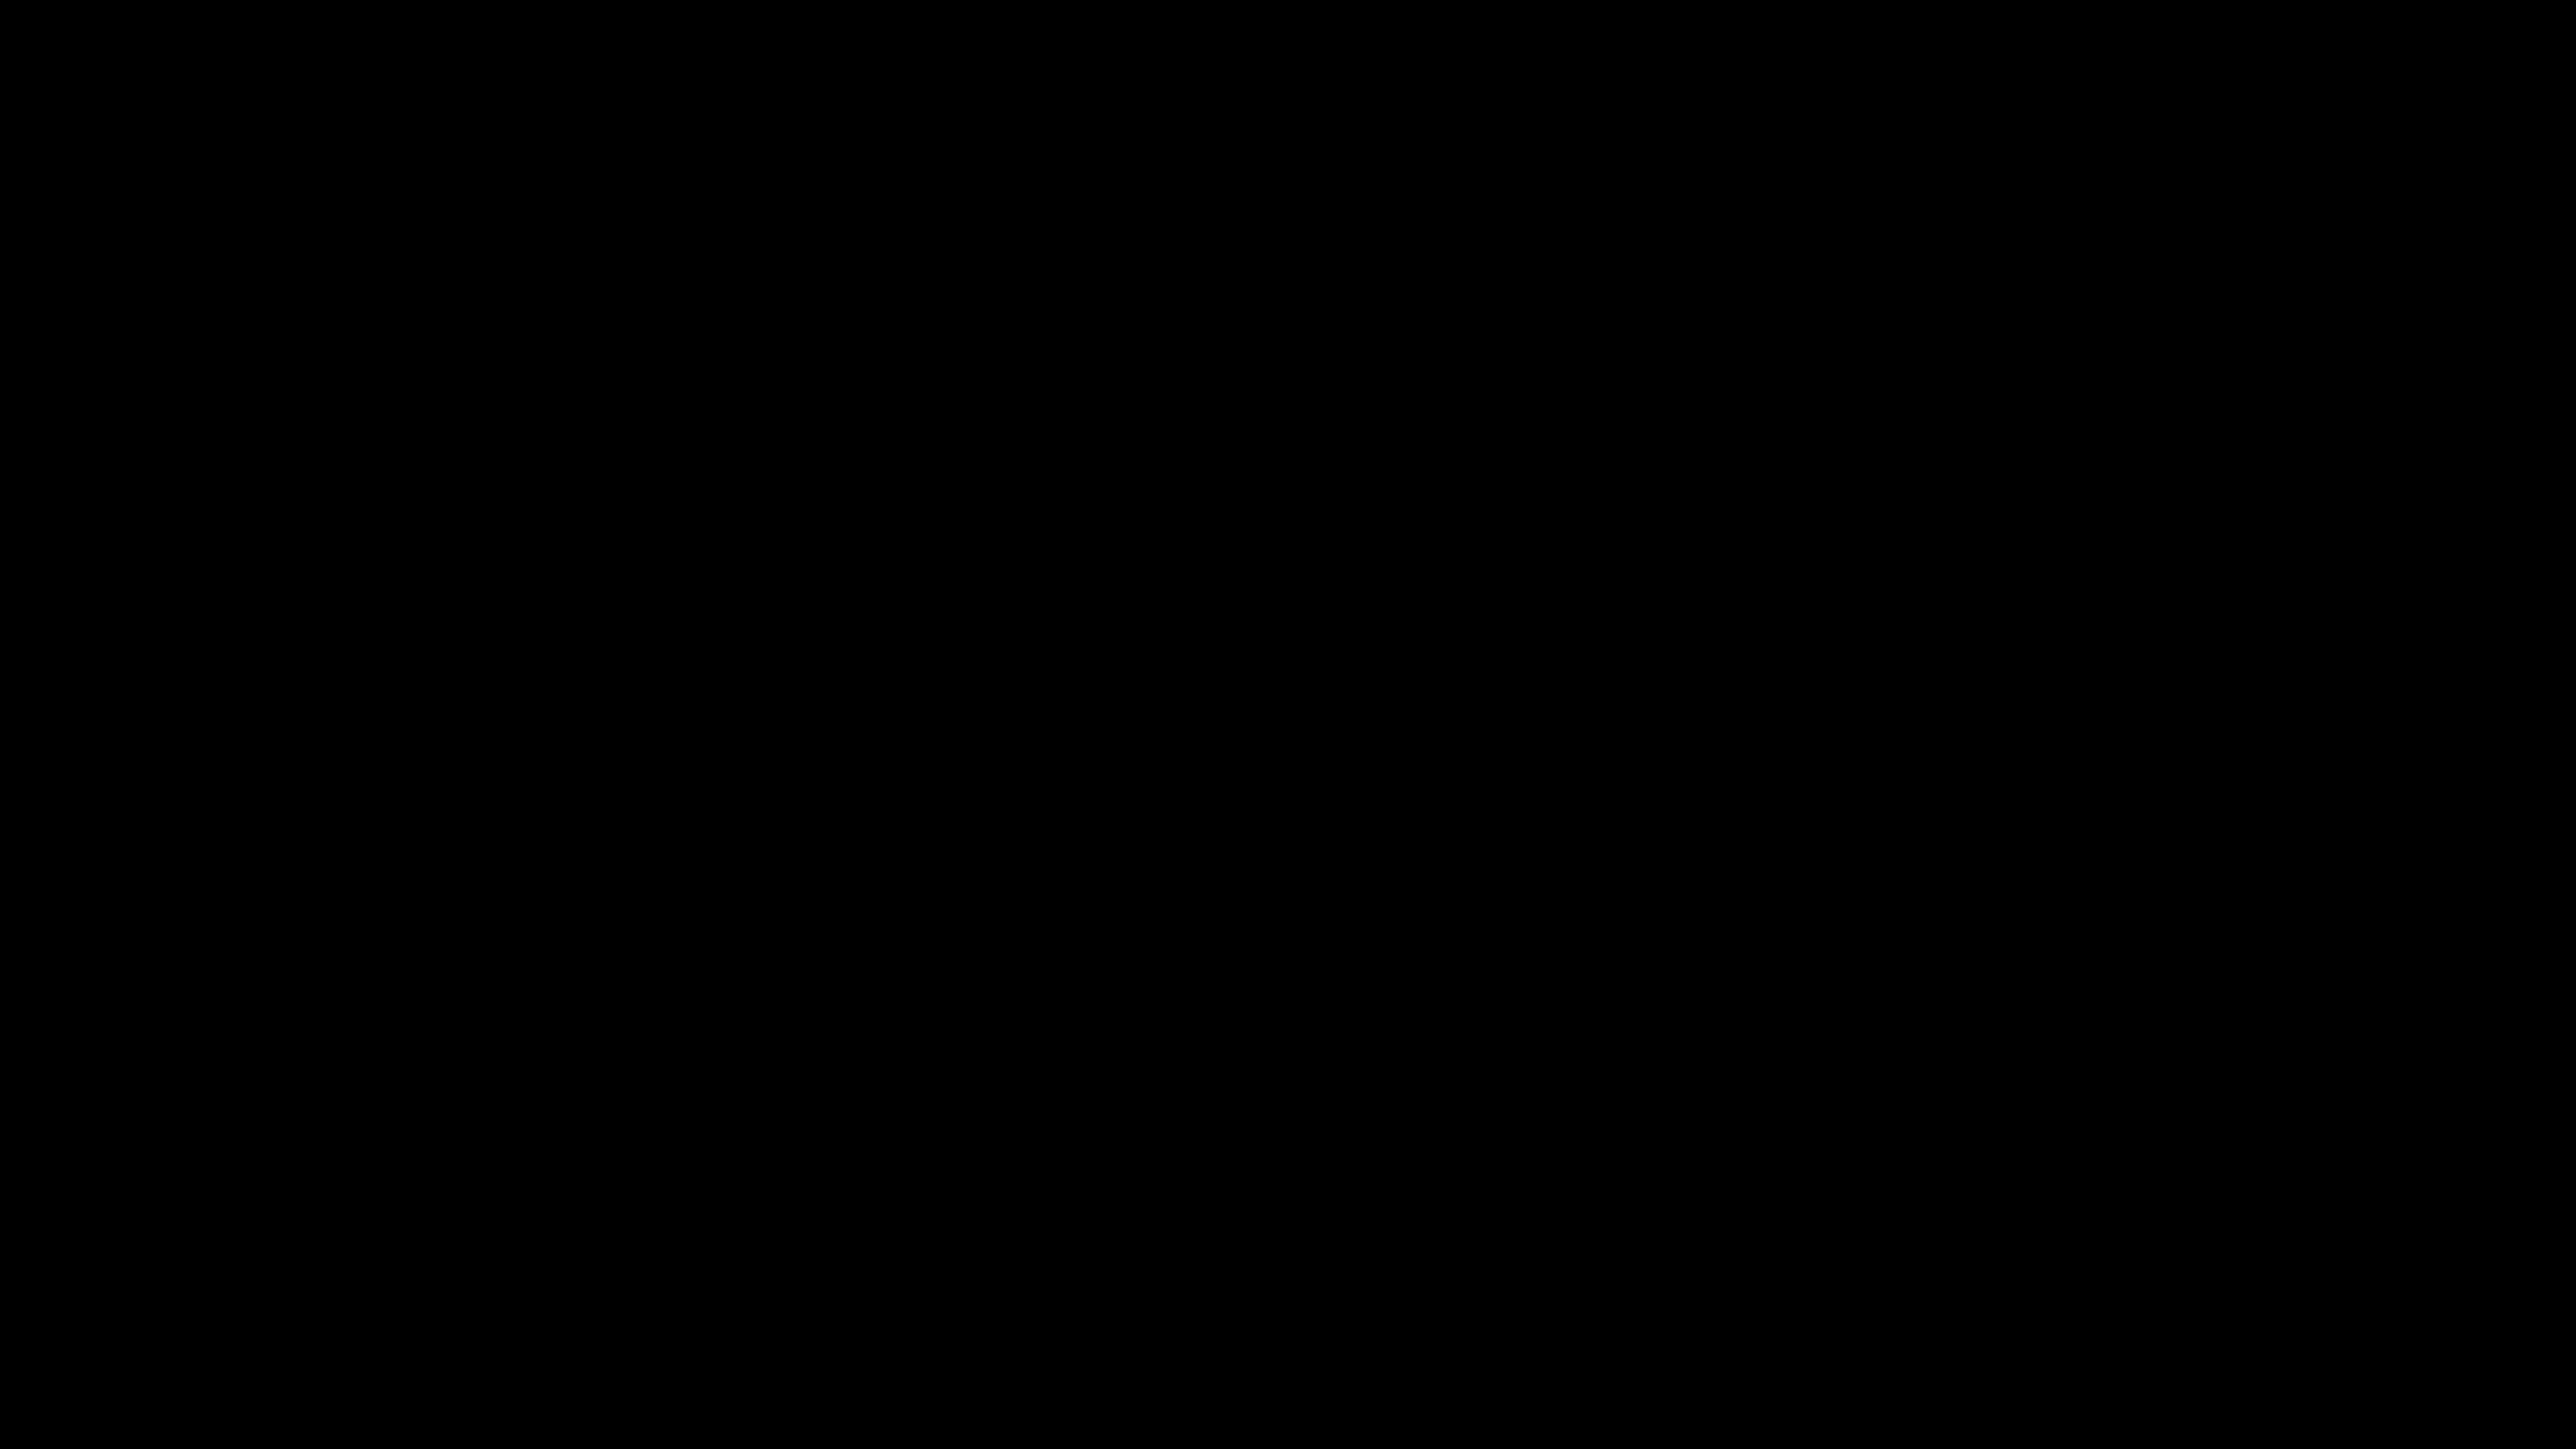 e7b374_2c3e6a2df0404adc9ce0e50f38d6d450_mv2